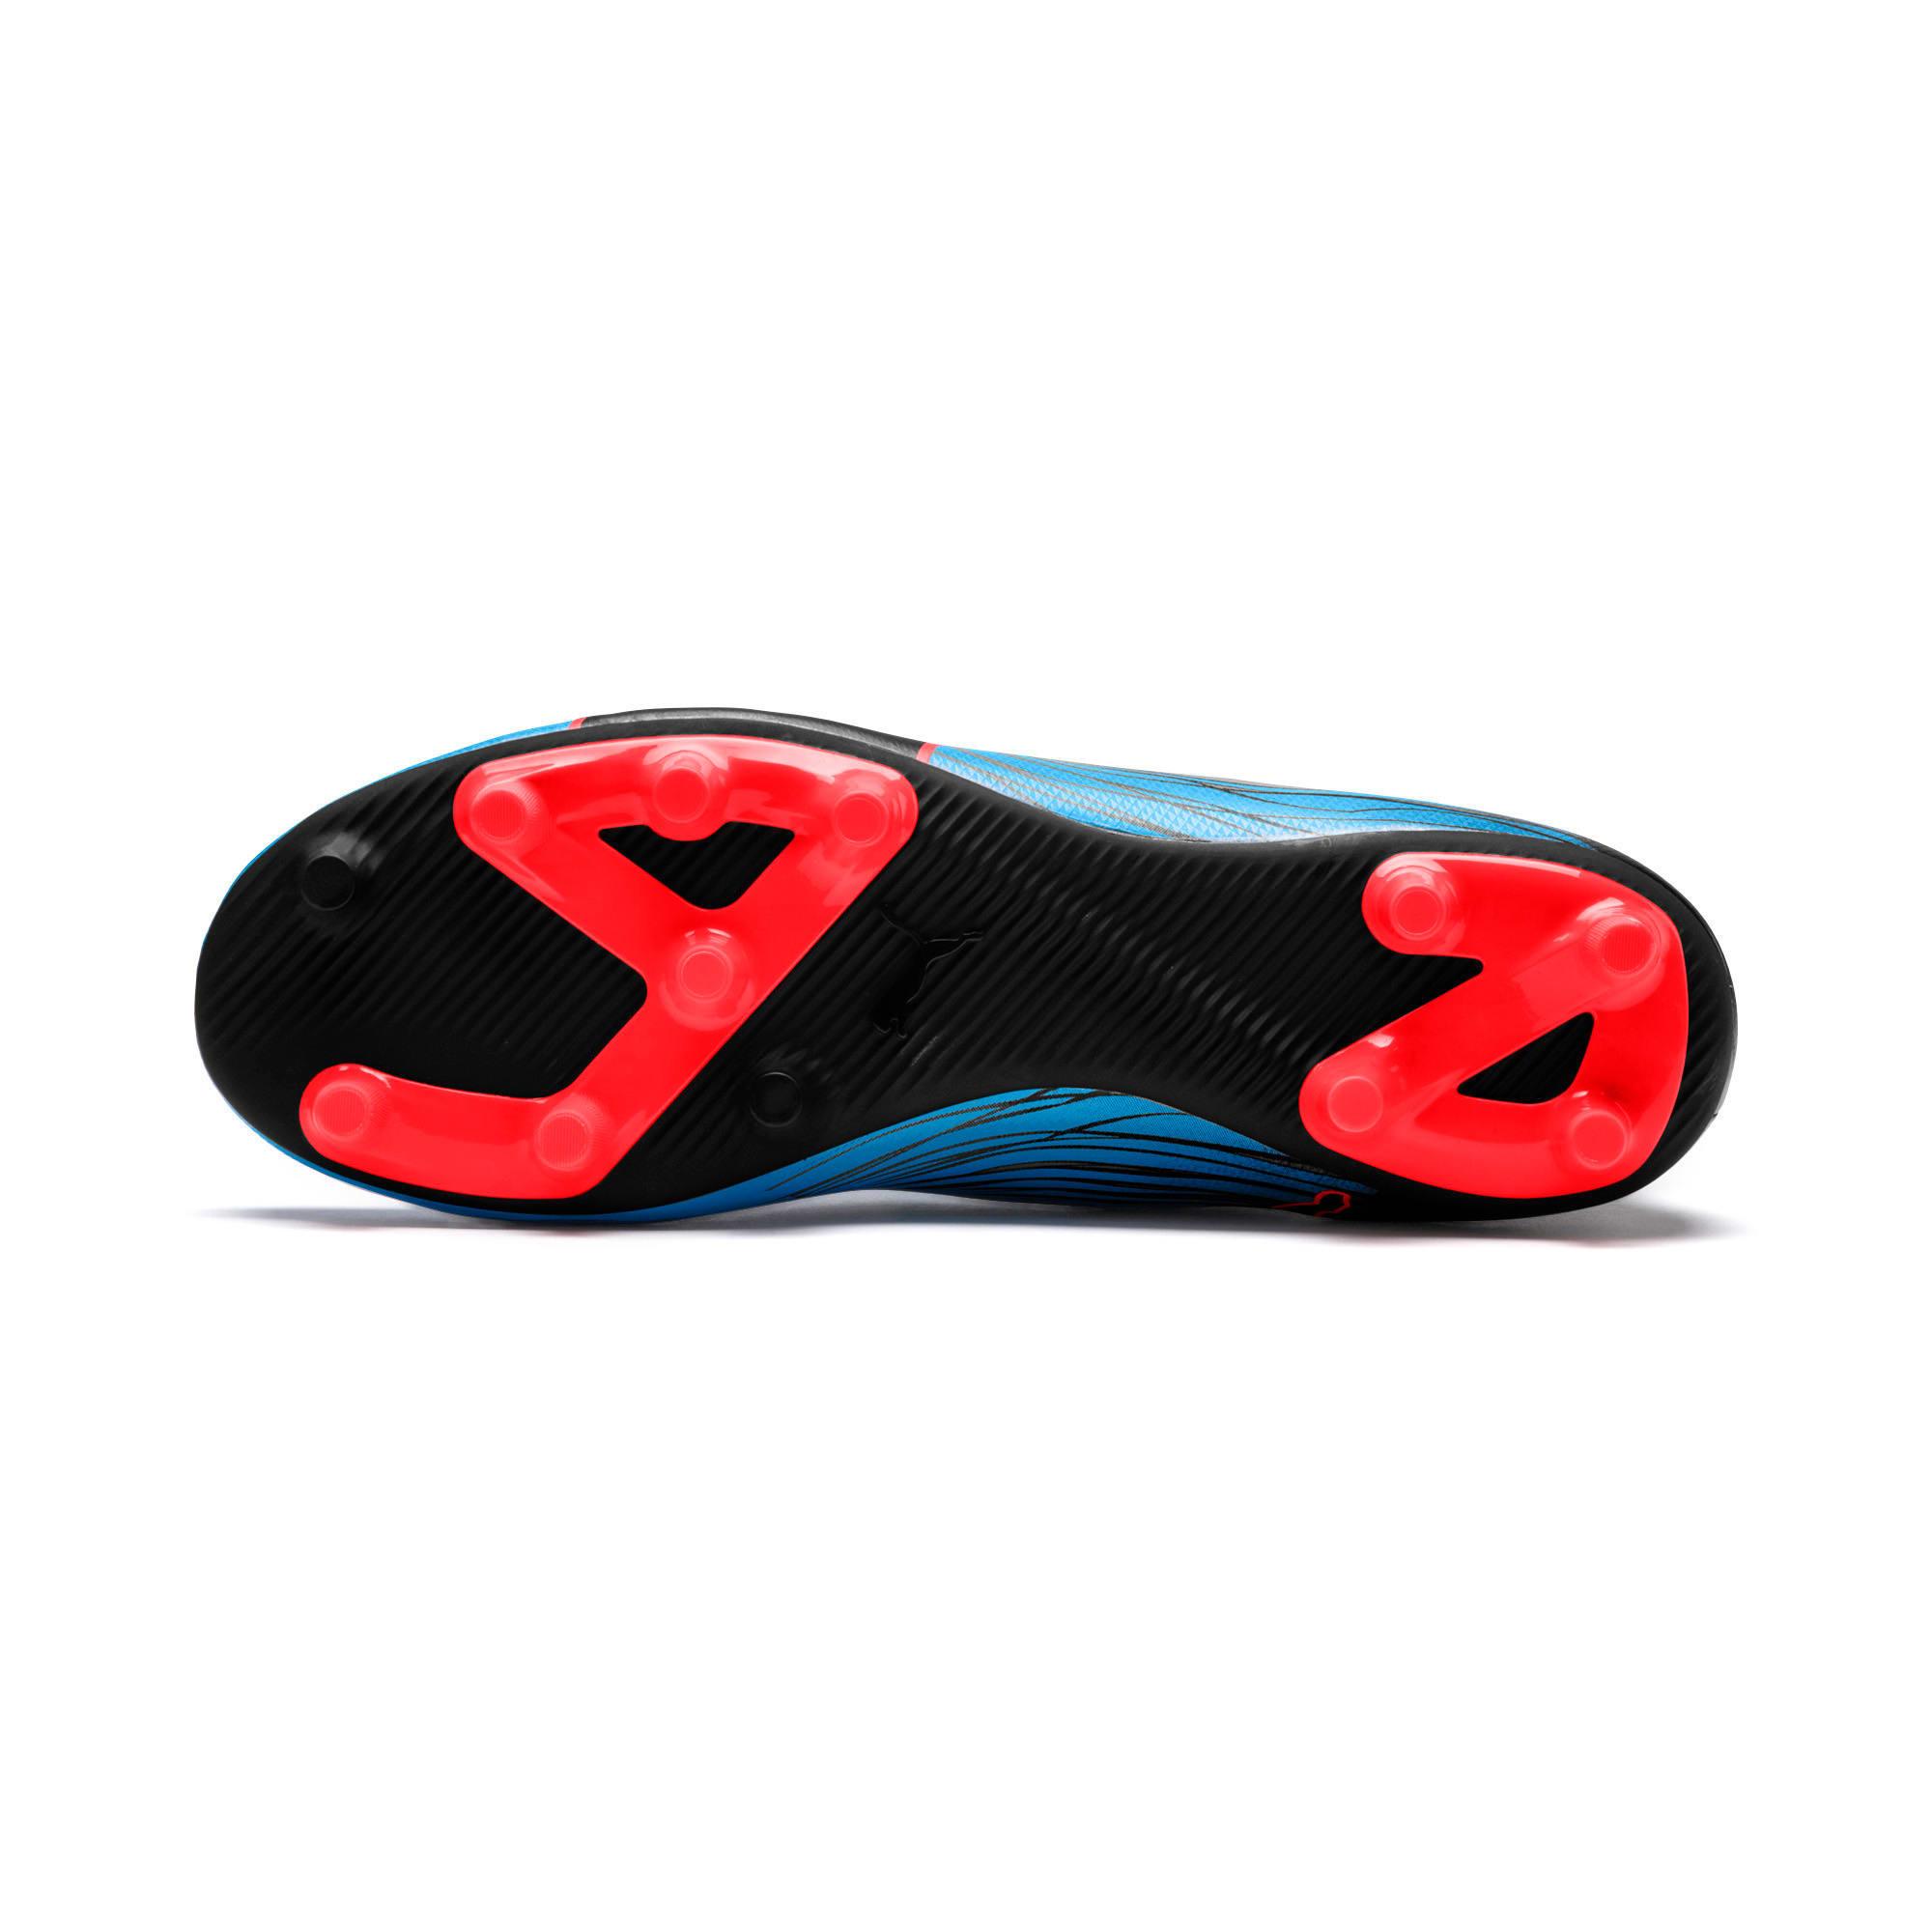 Thumbnail 3 of evoKNIT FTB II FG Men's Football Boots, Bleu Azur-Red Blast-Black, medium-IND